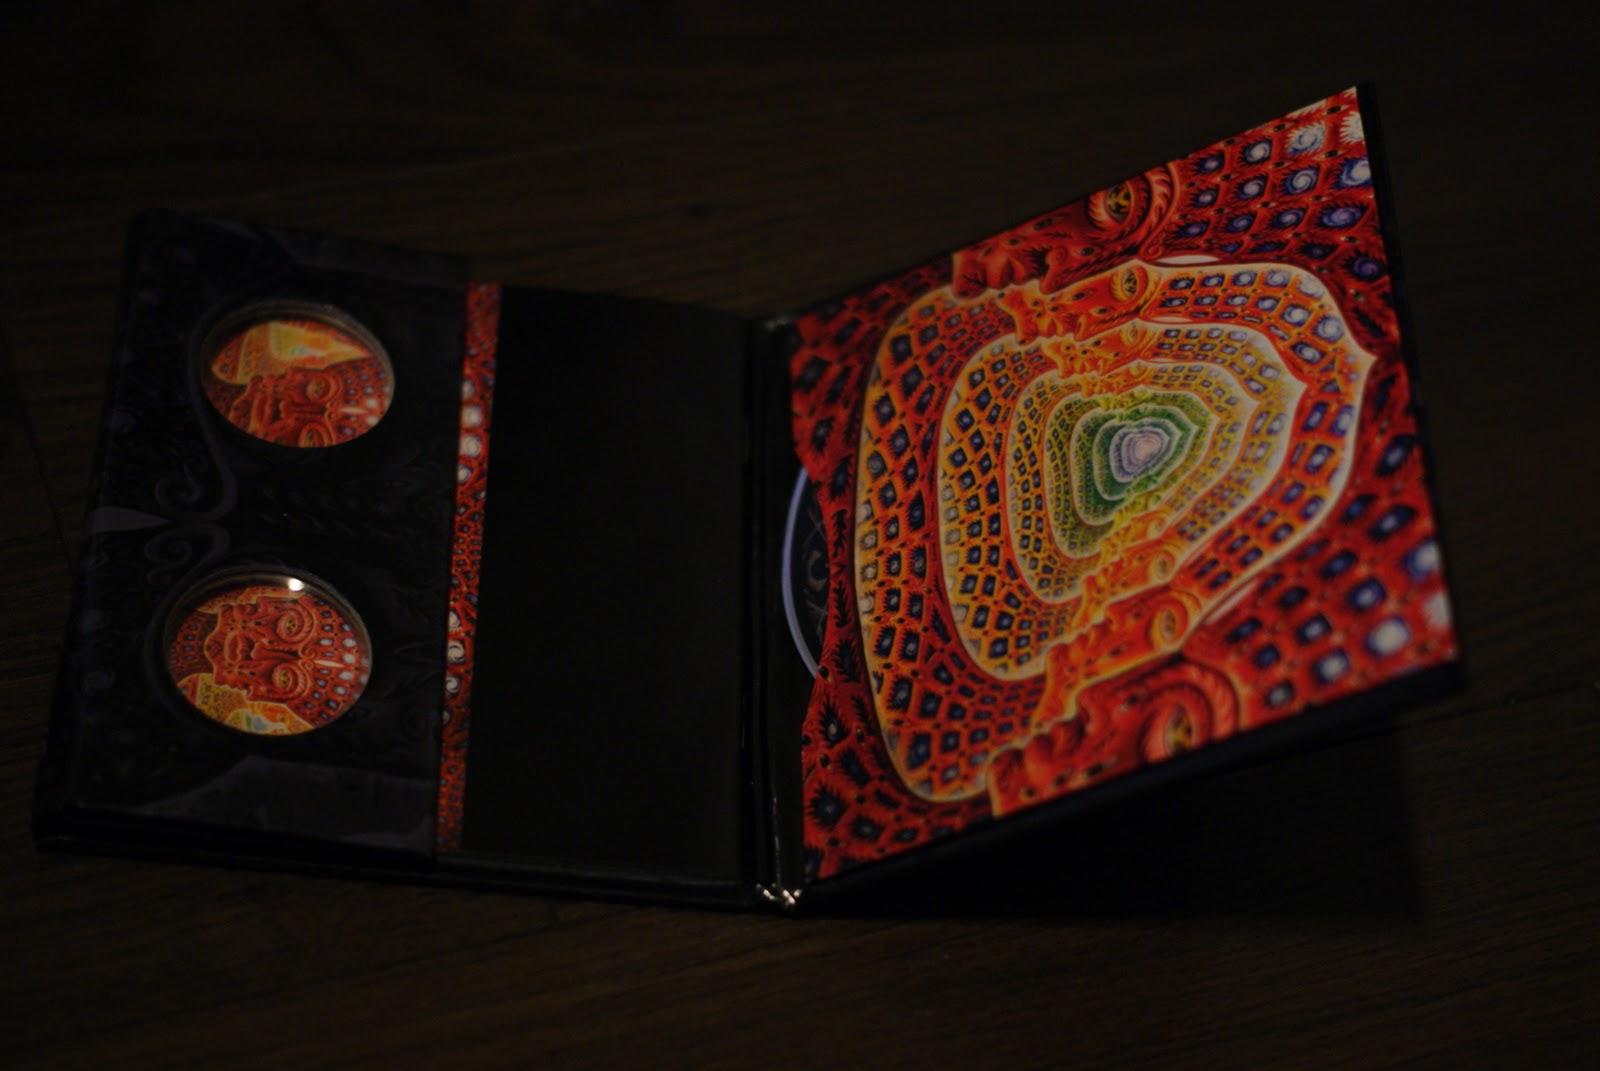 Album Packaging: 10,000 Days - Tool